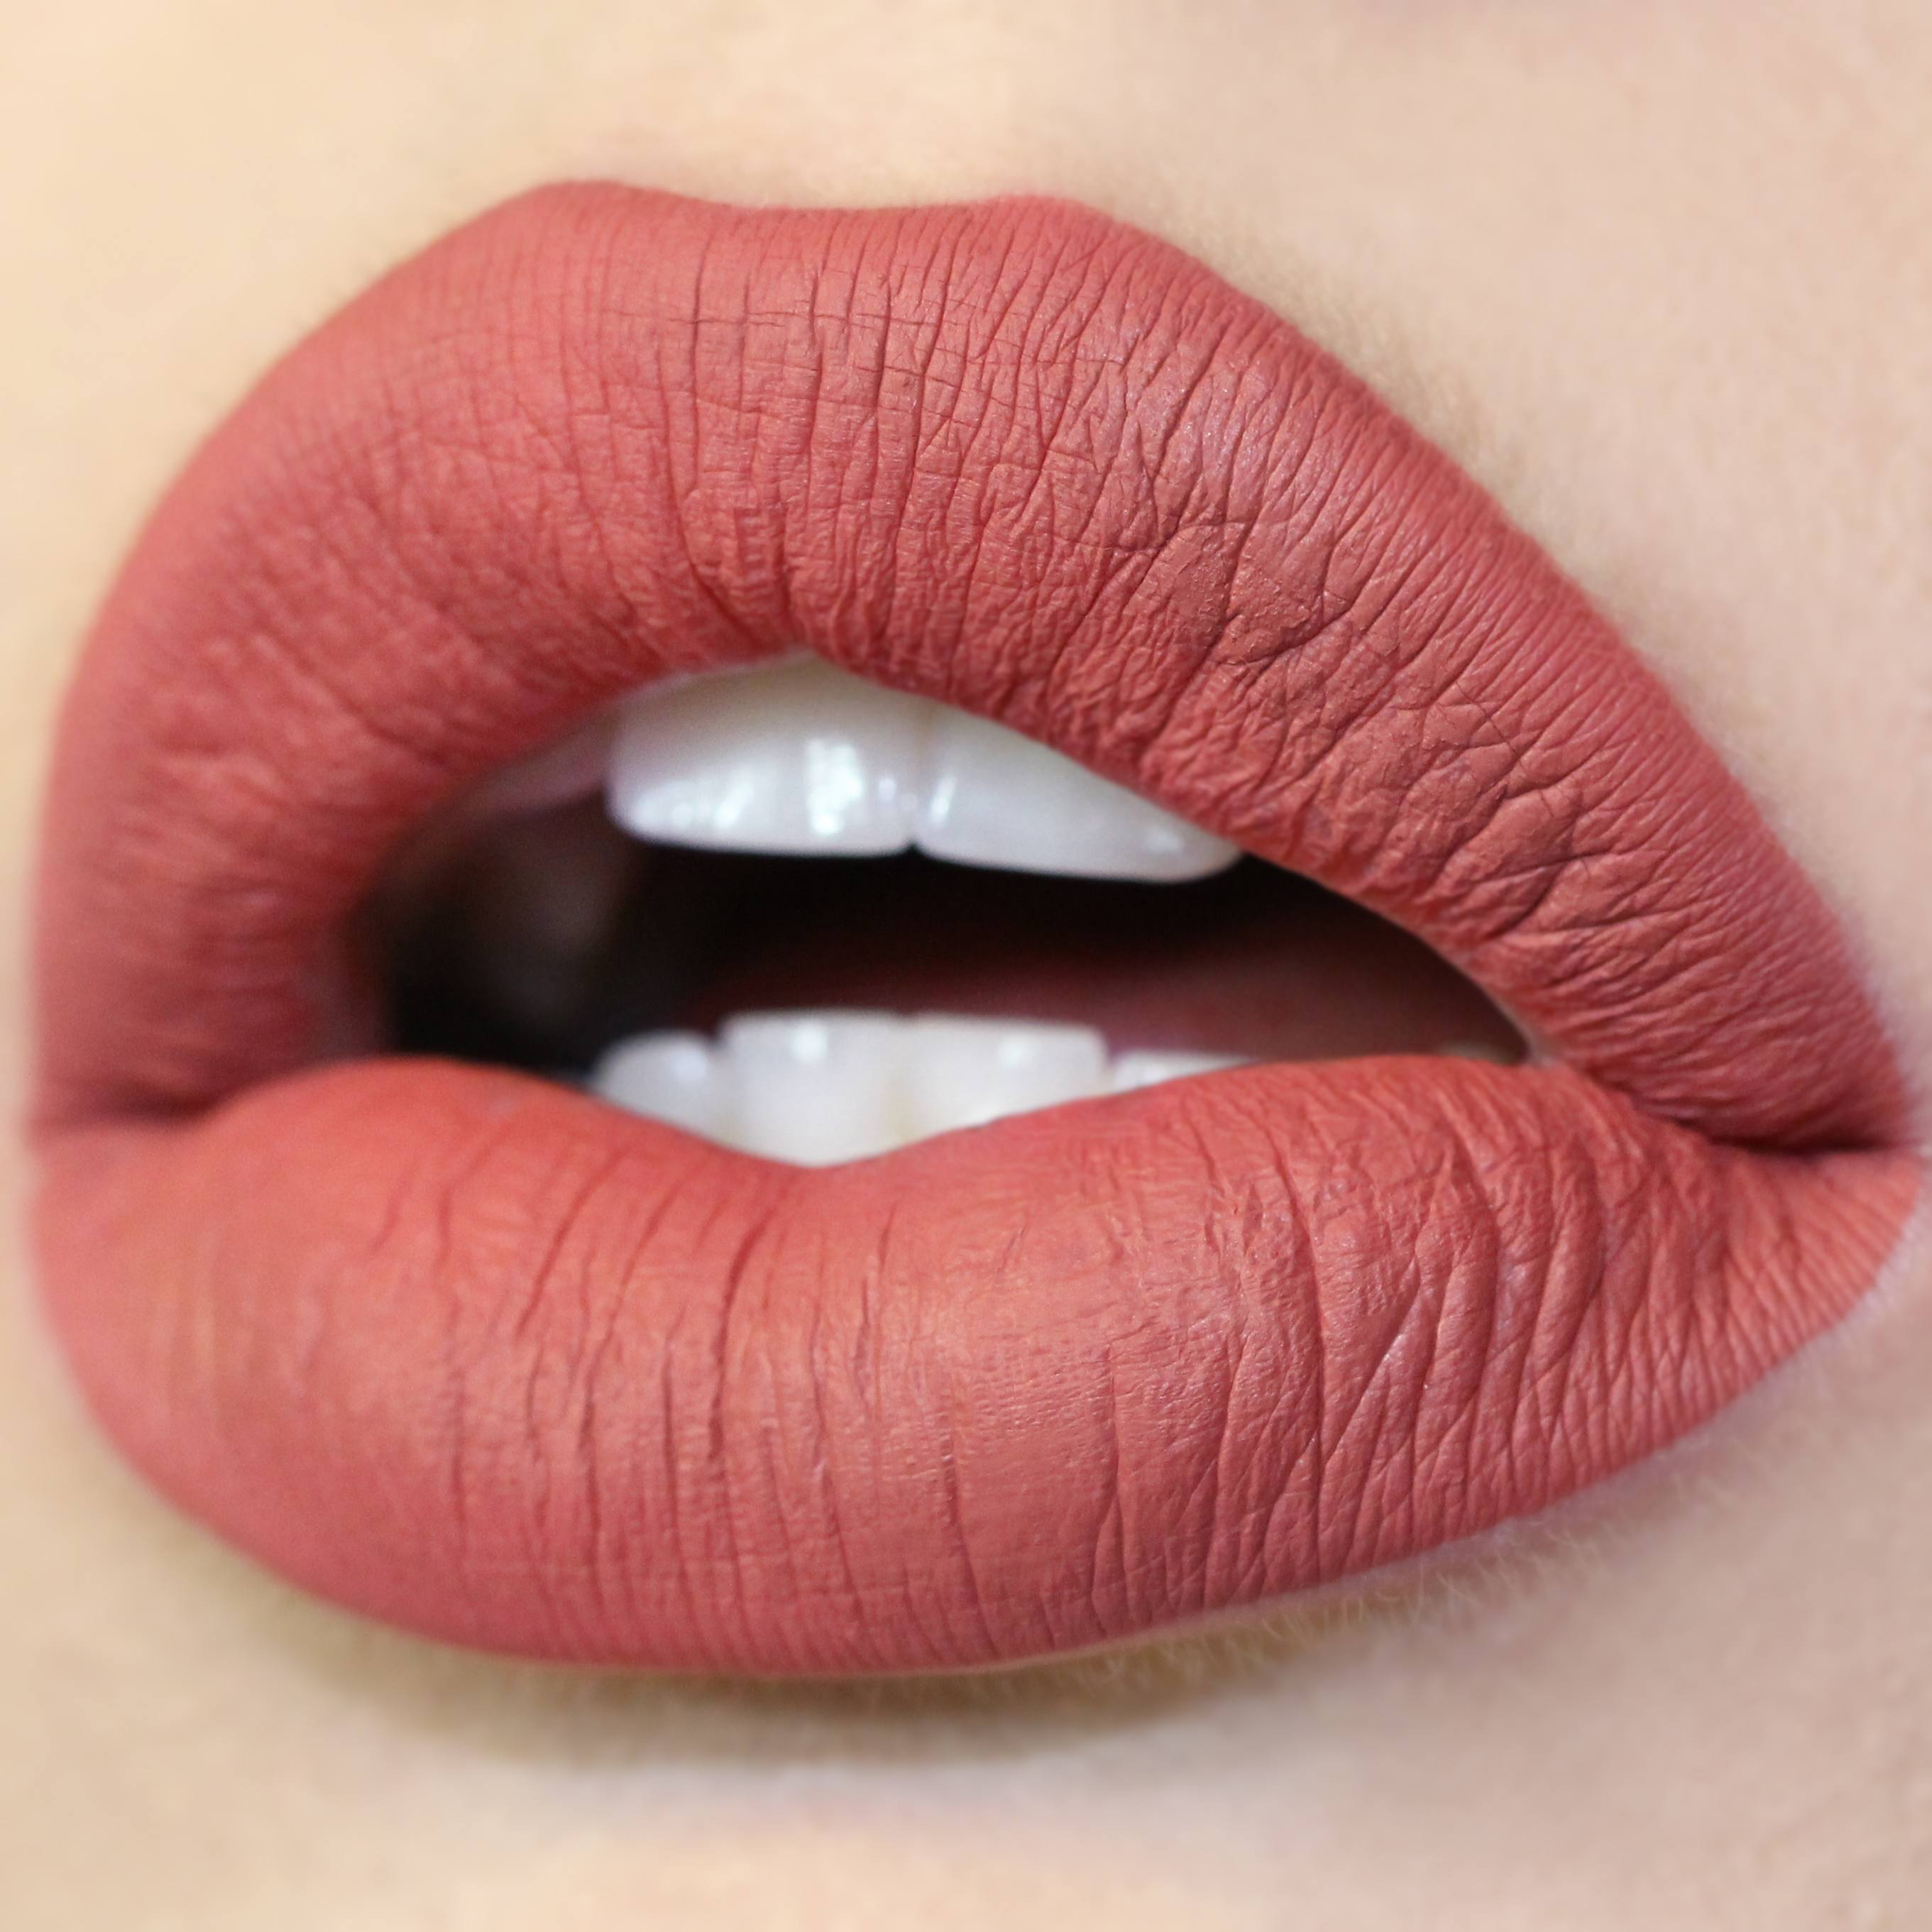 colourpop ultra matte lip สี bumble